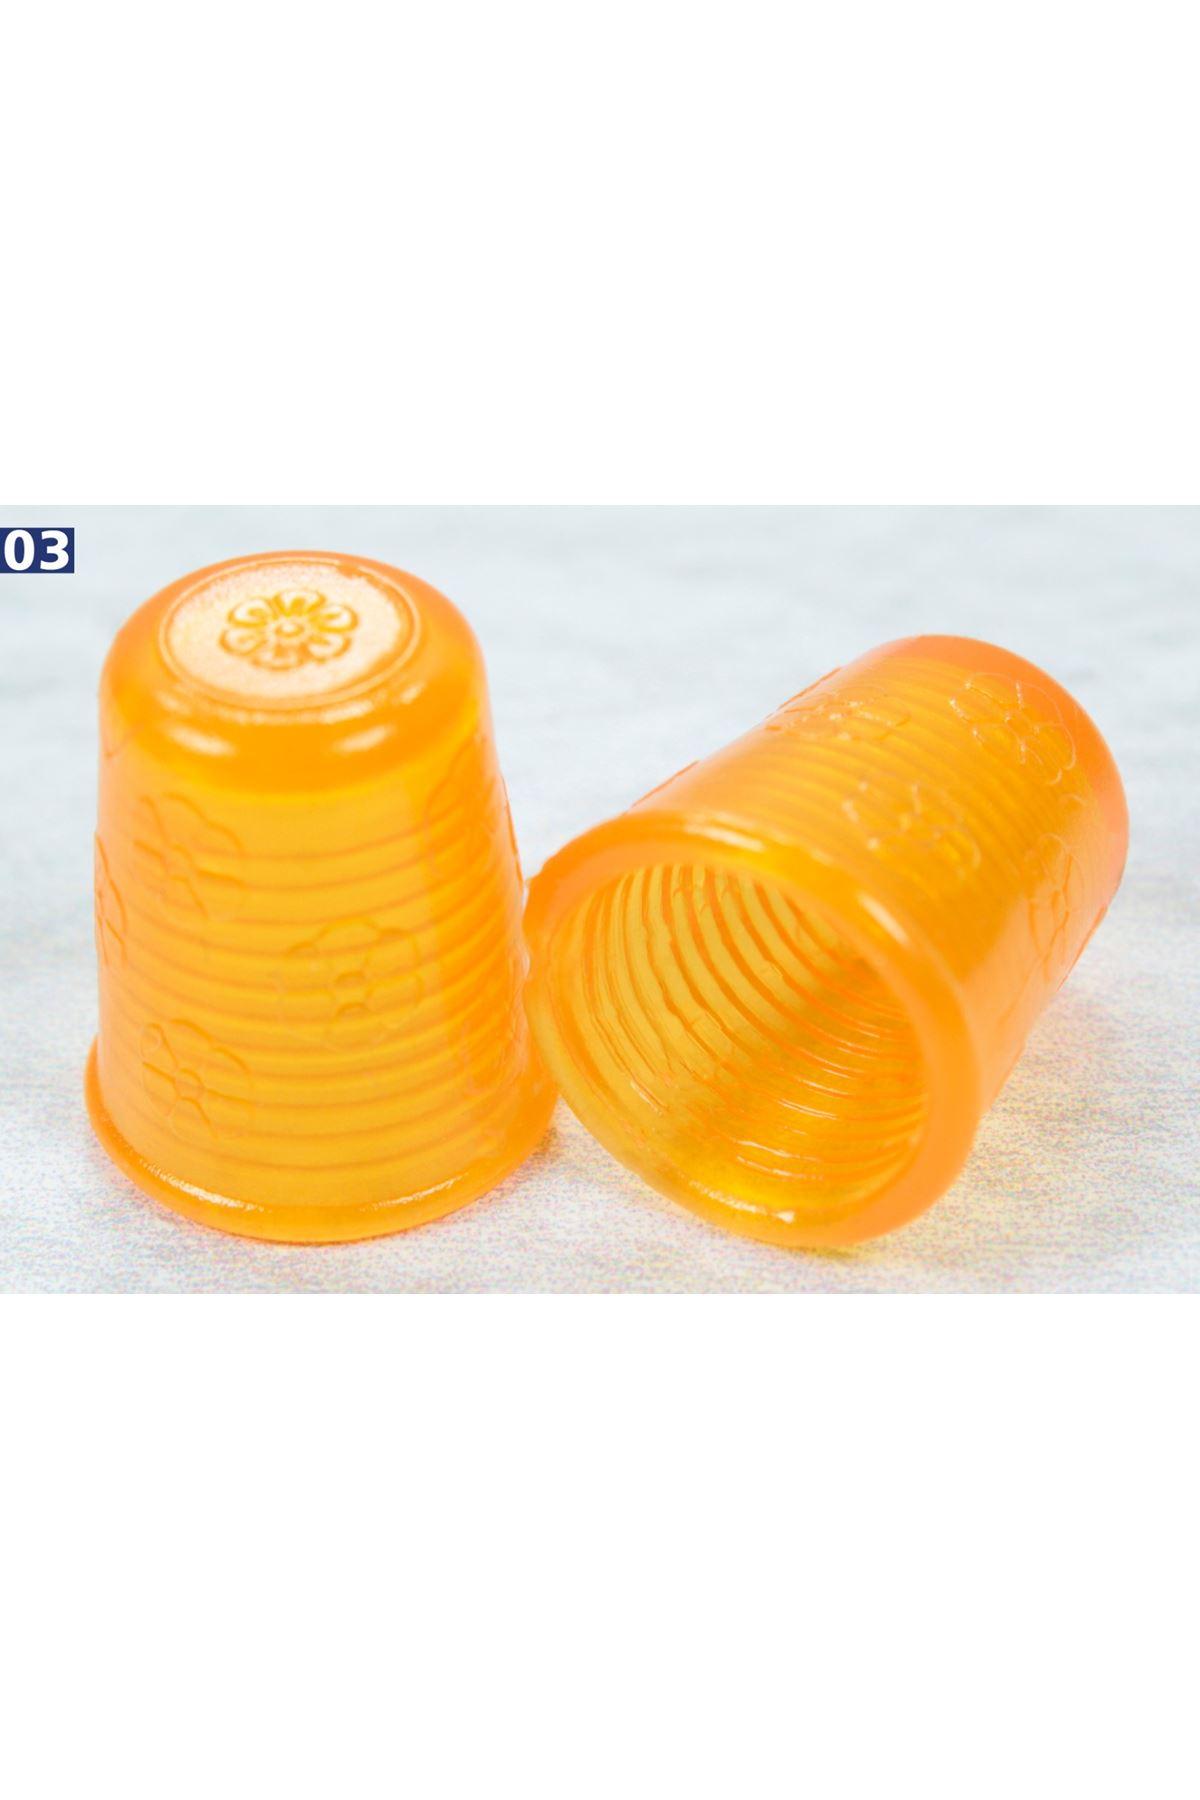 Yüksük Plastik 1 Çift - Turuncu